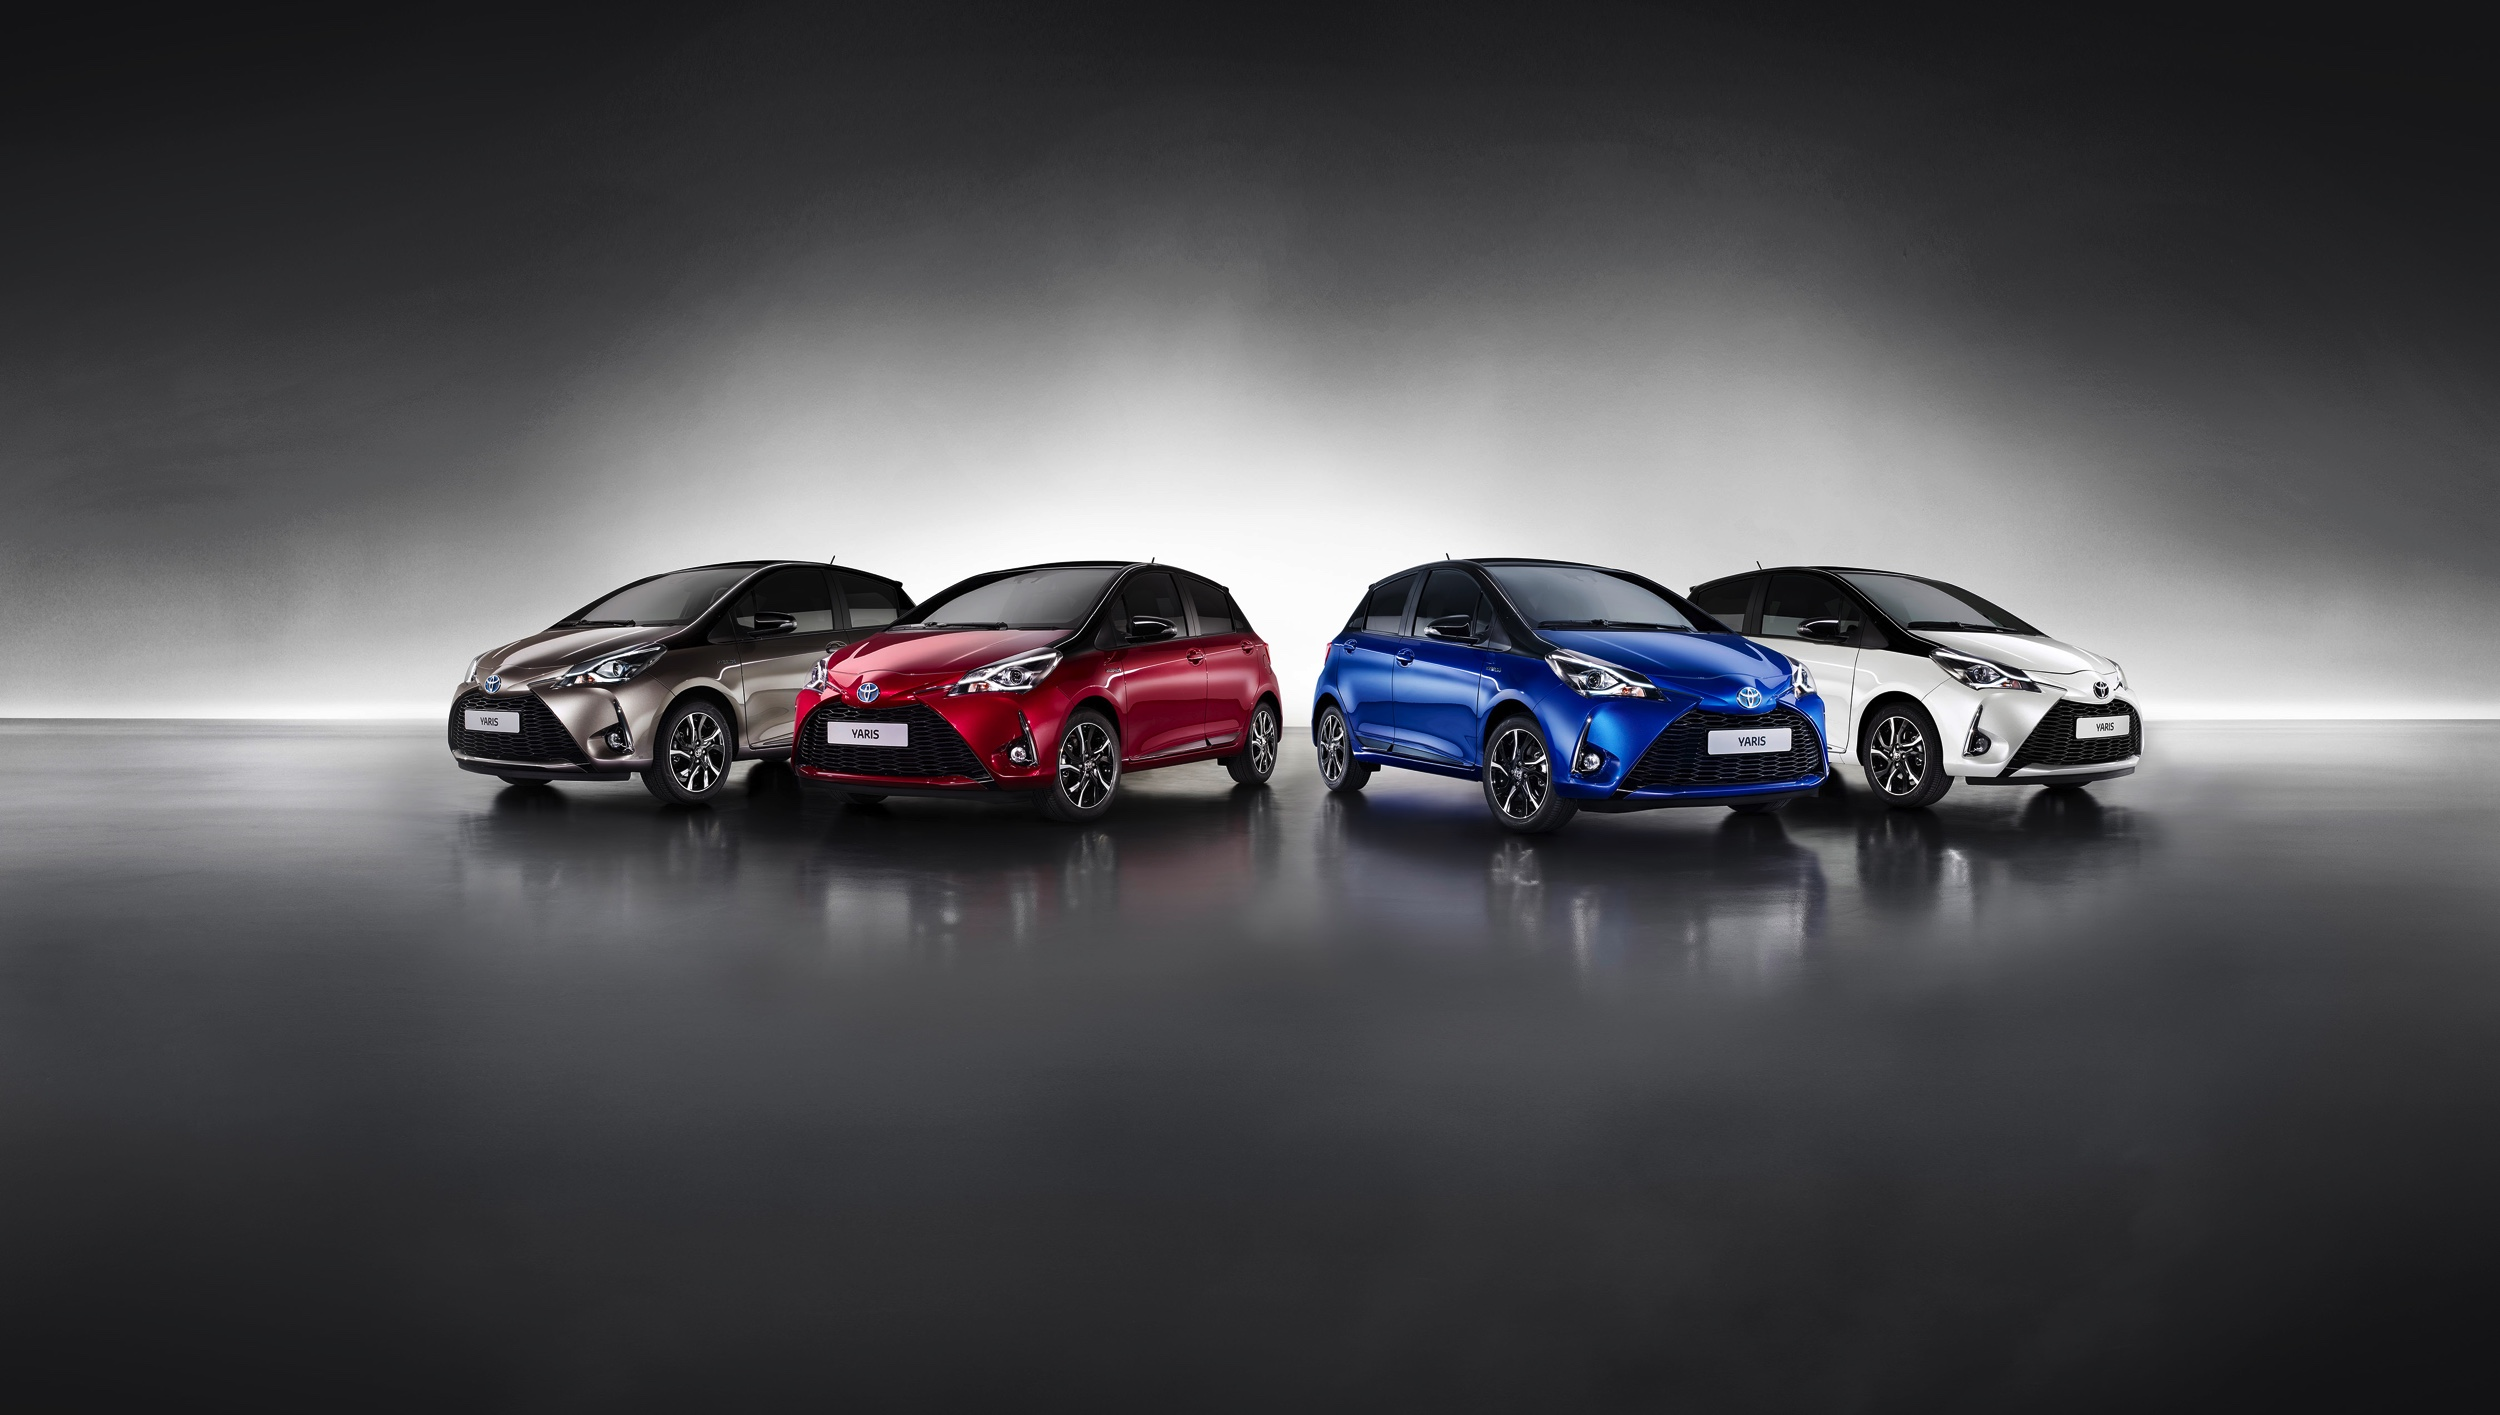 Vernieuwde Toyota Yaris - Autovisie.nl